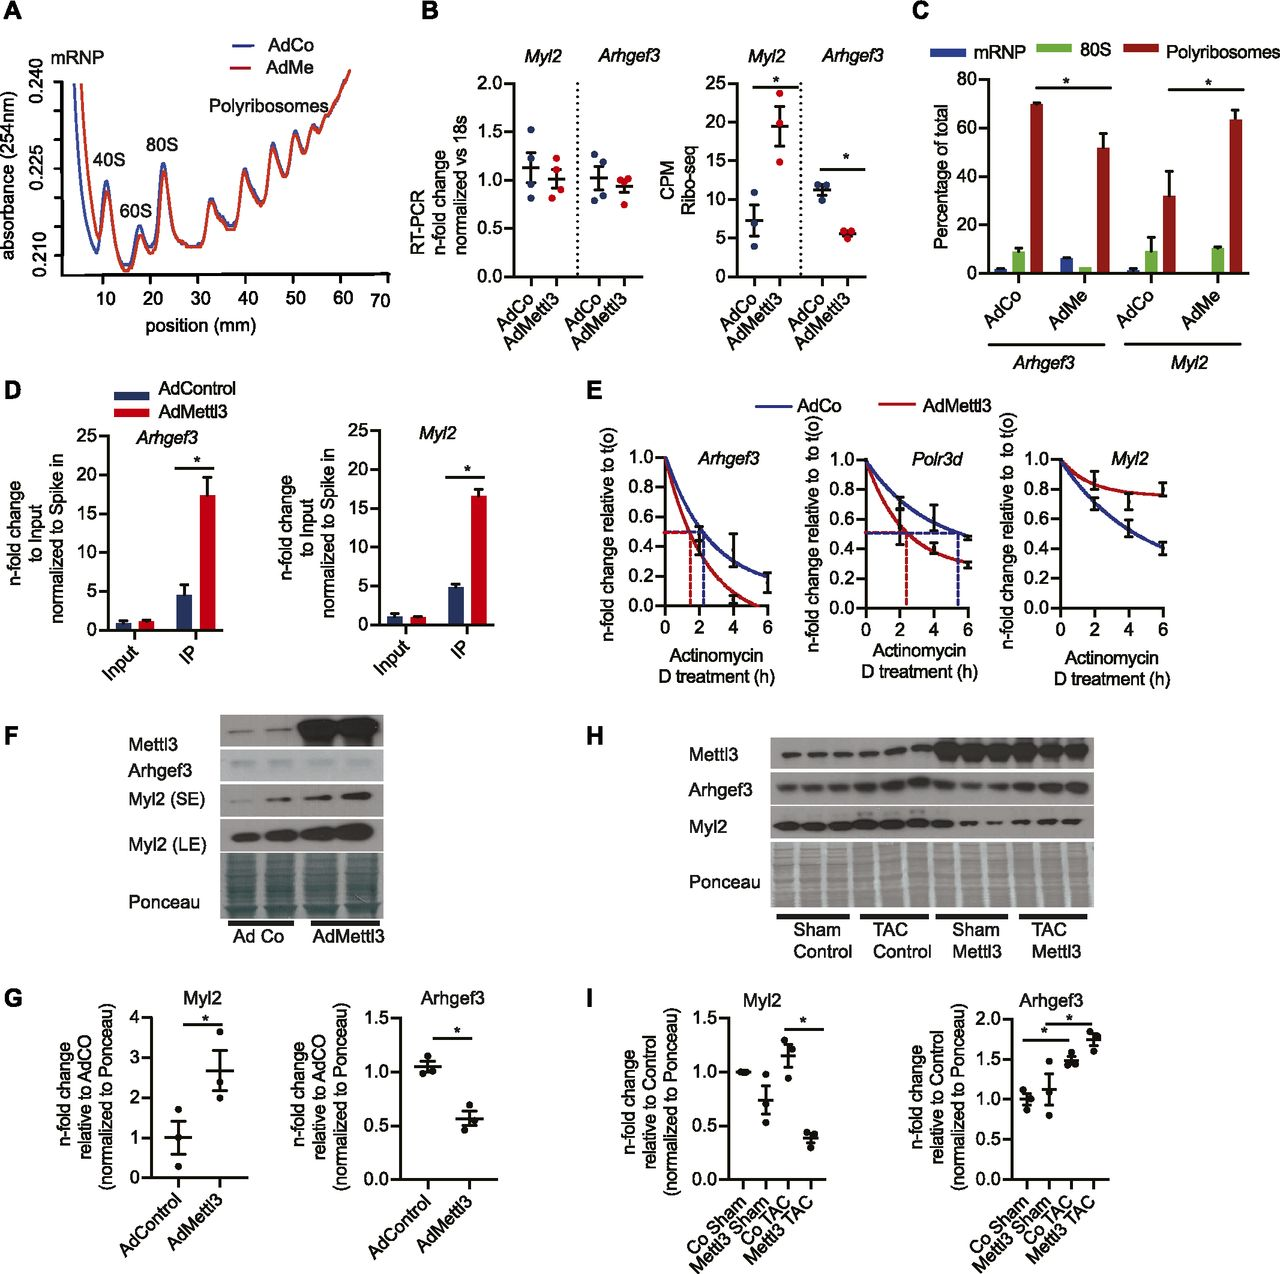 m6A-mRNA methylation regulates cardiac gene expression and